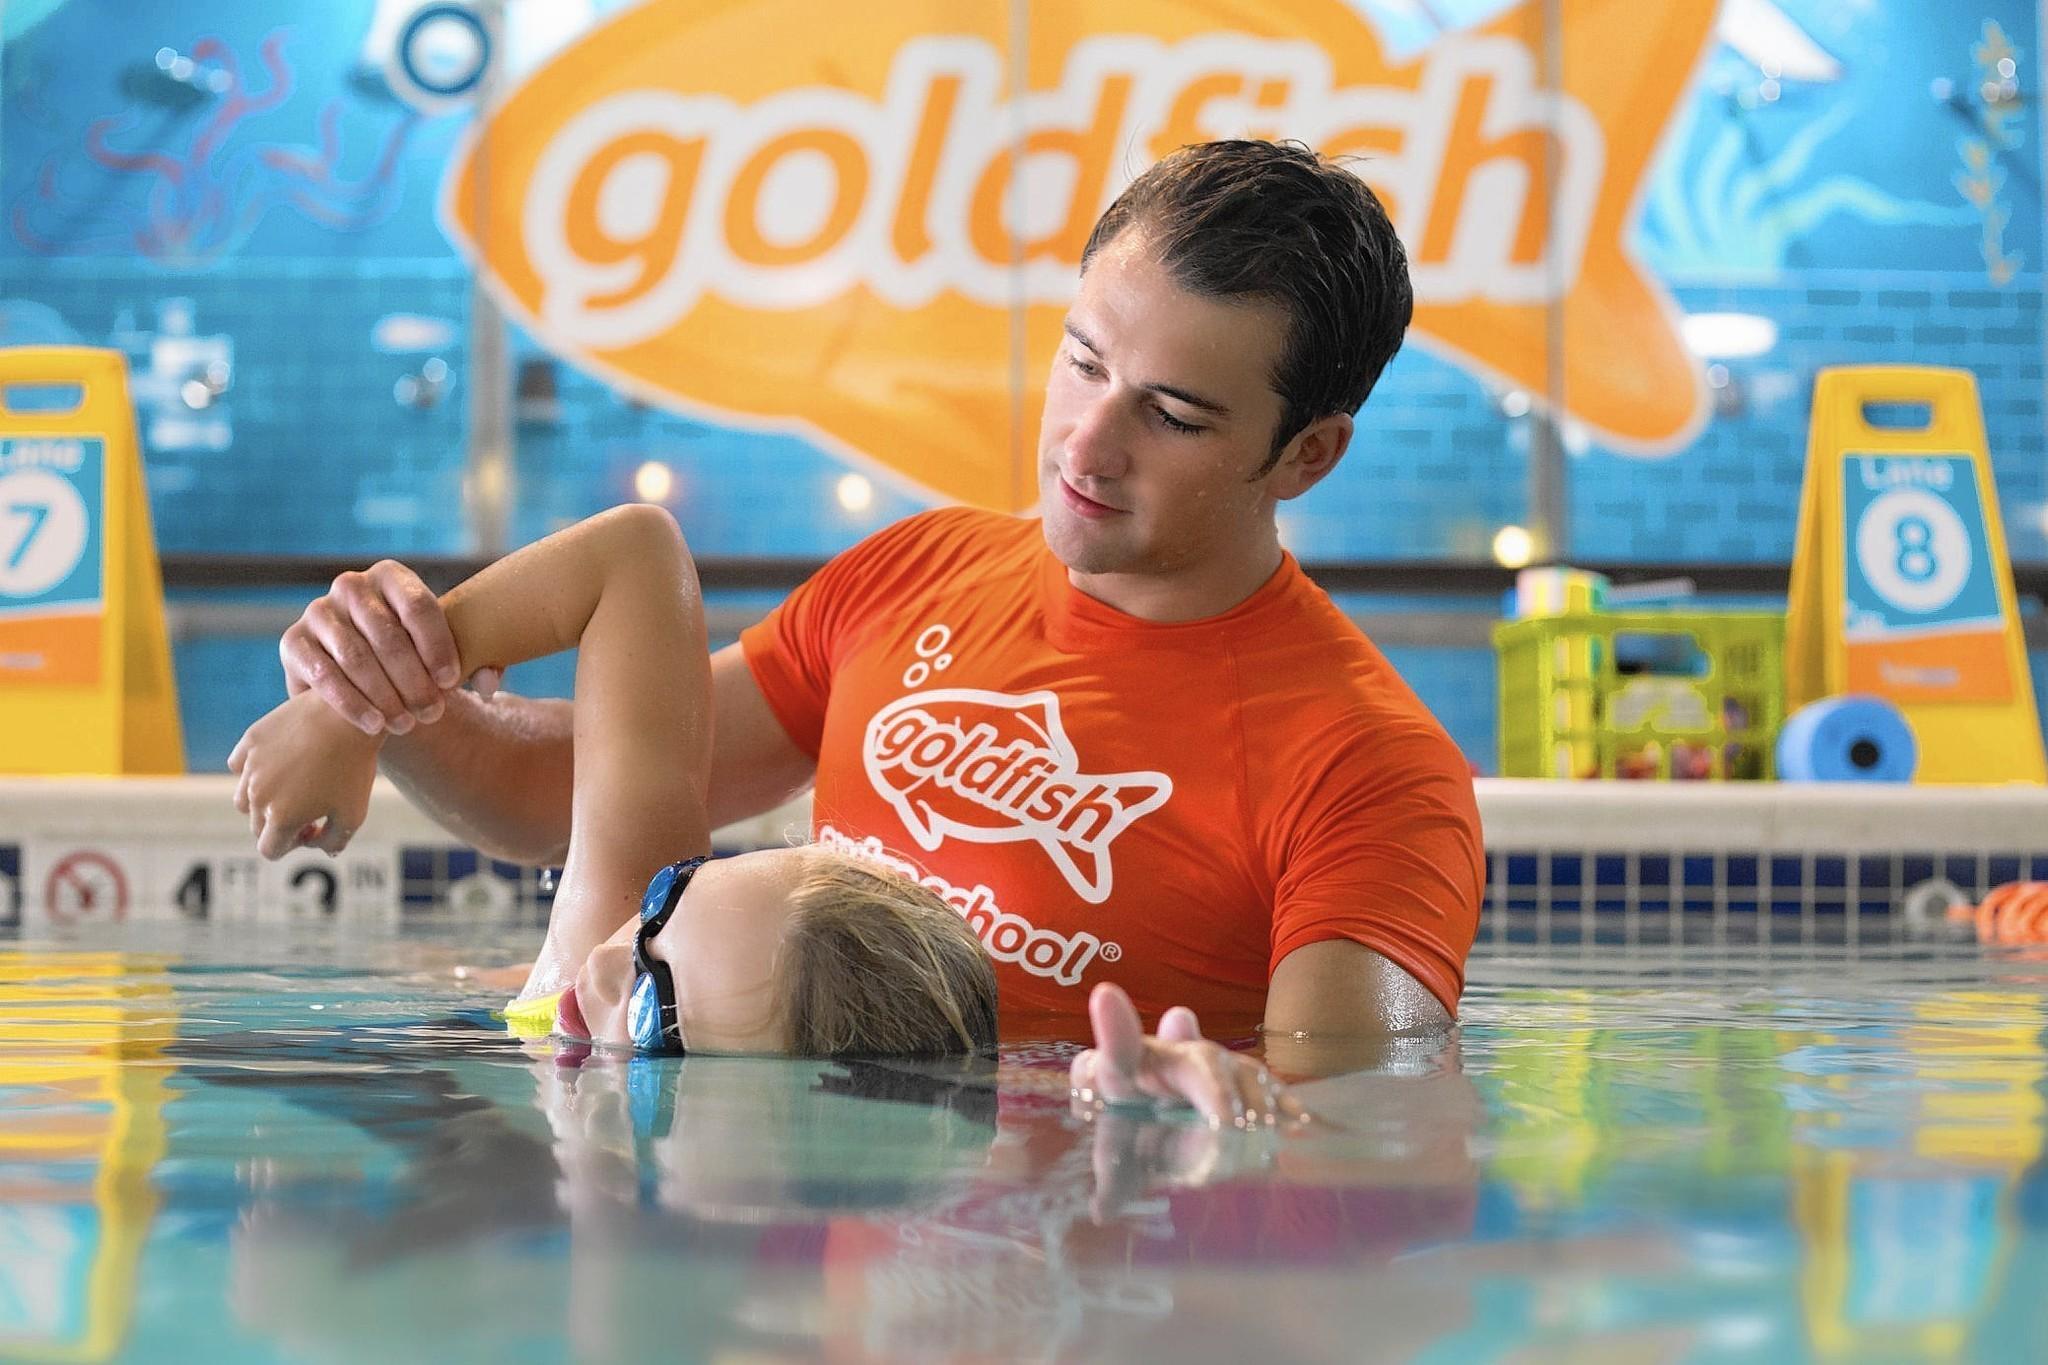 Goldfish Swim School To Open New Location In Arlington